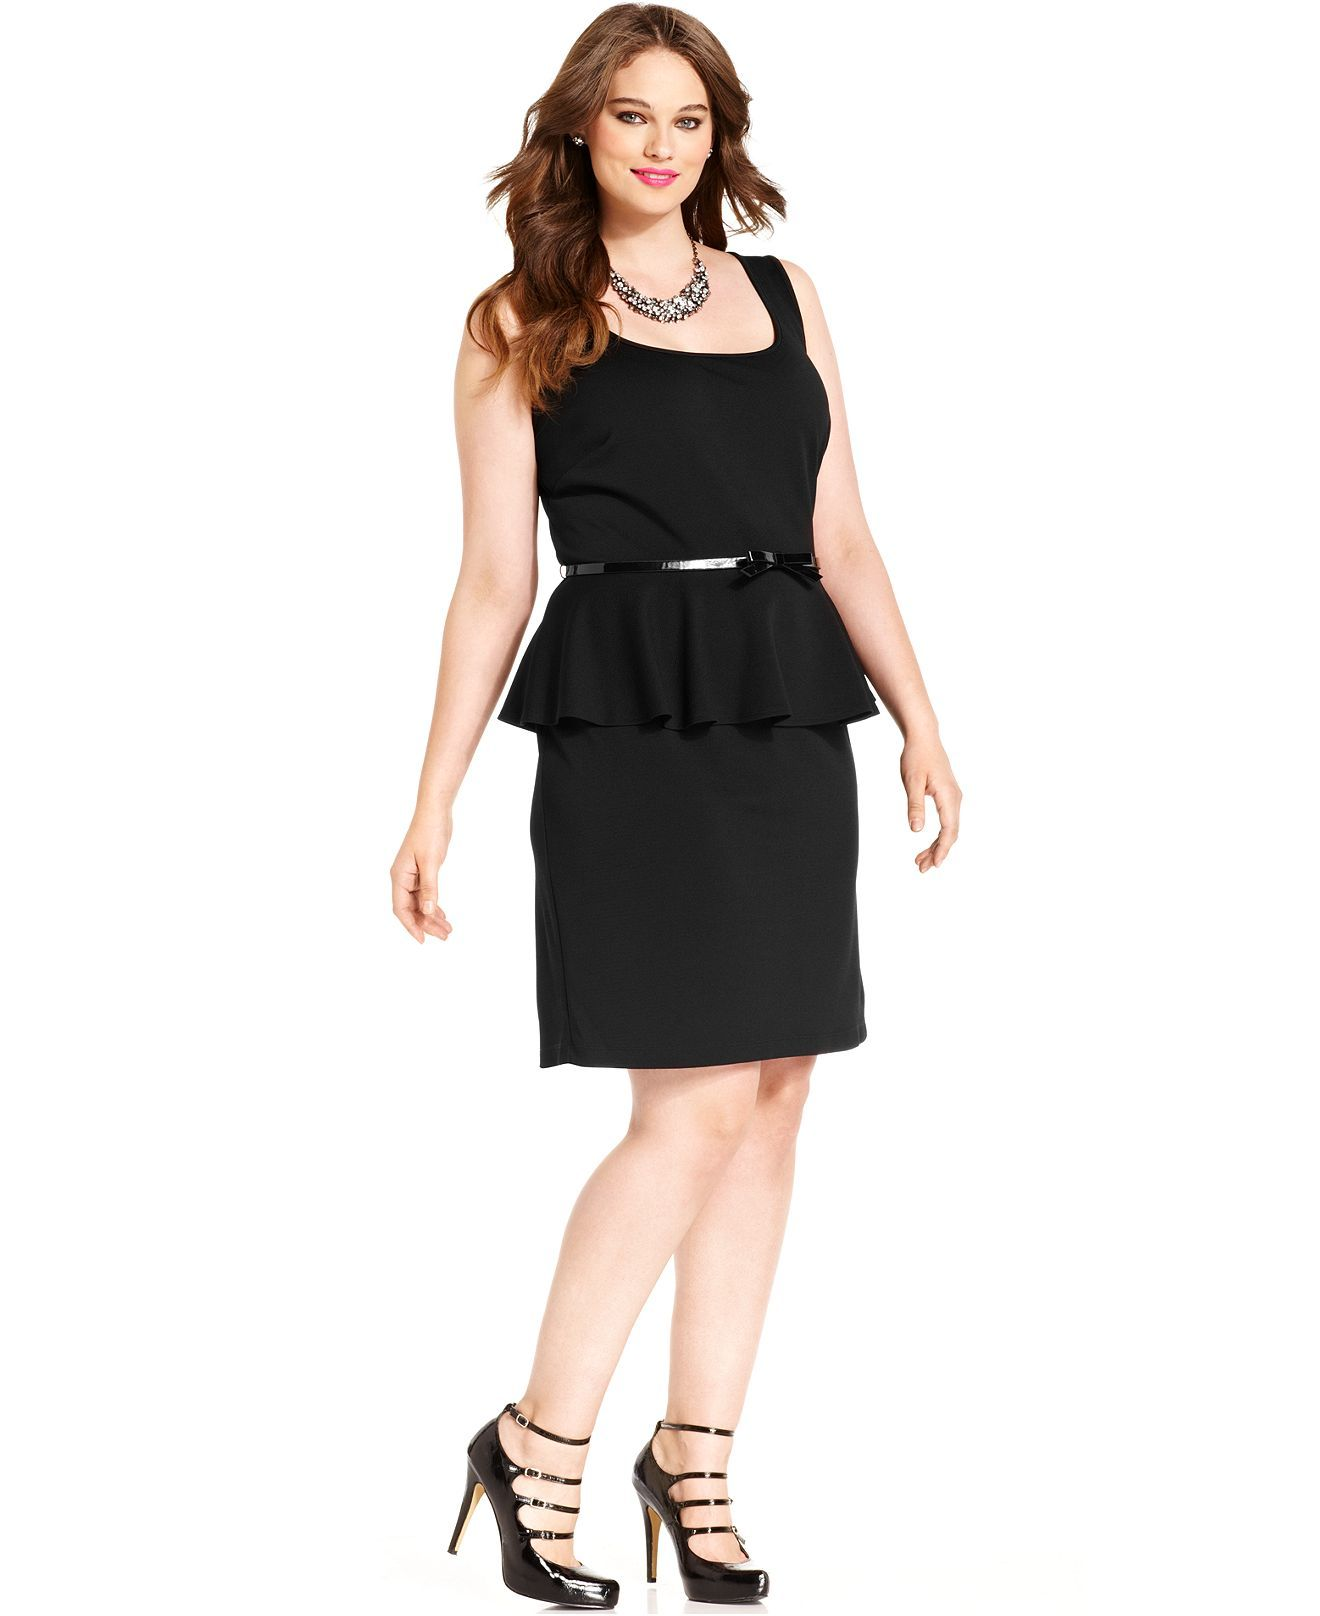 Lace dress macys  Love Squared Plus Size Dress Sleeveless Peplum LaceBowBack  Plus